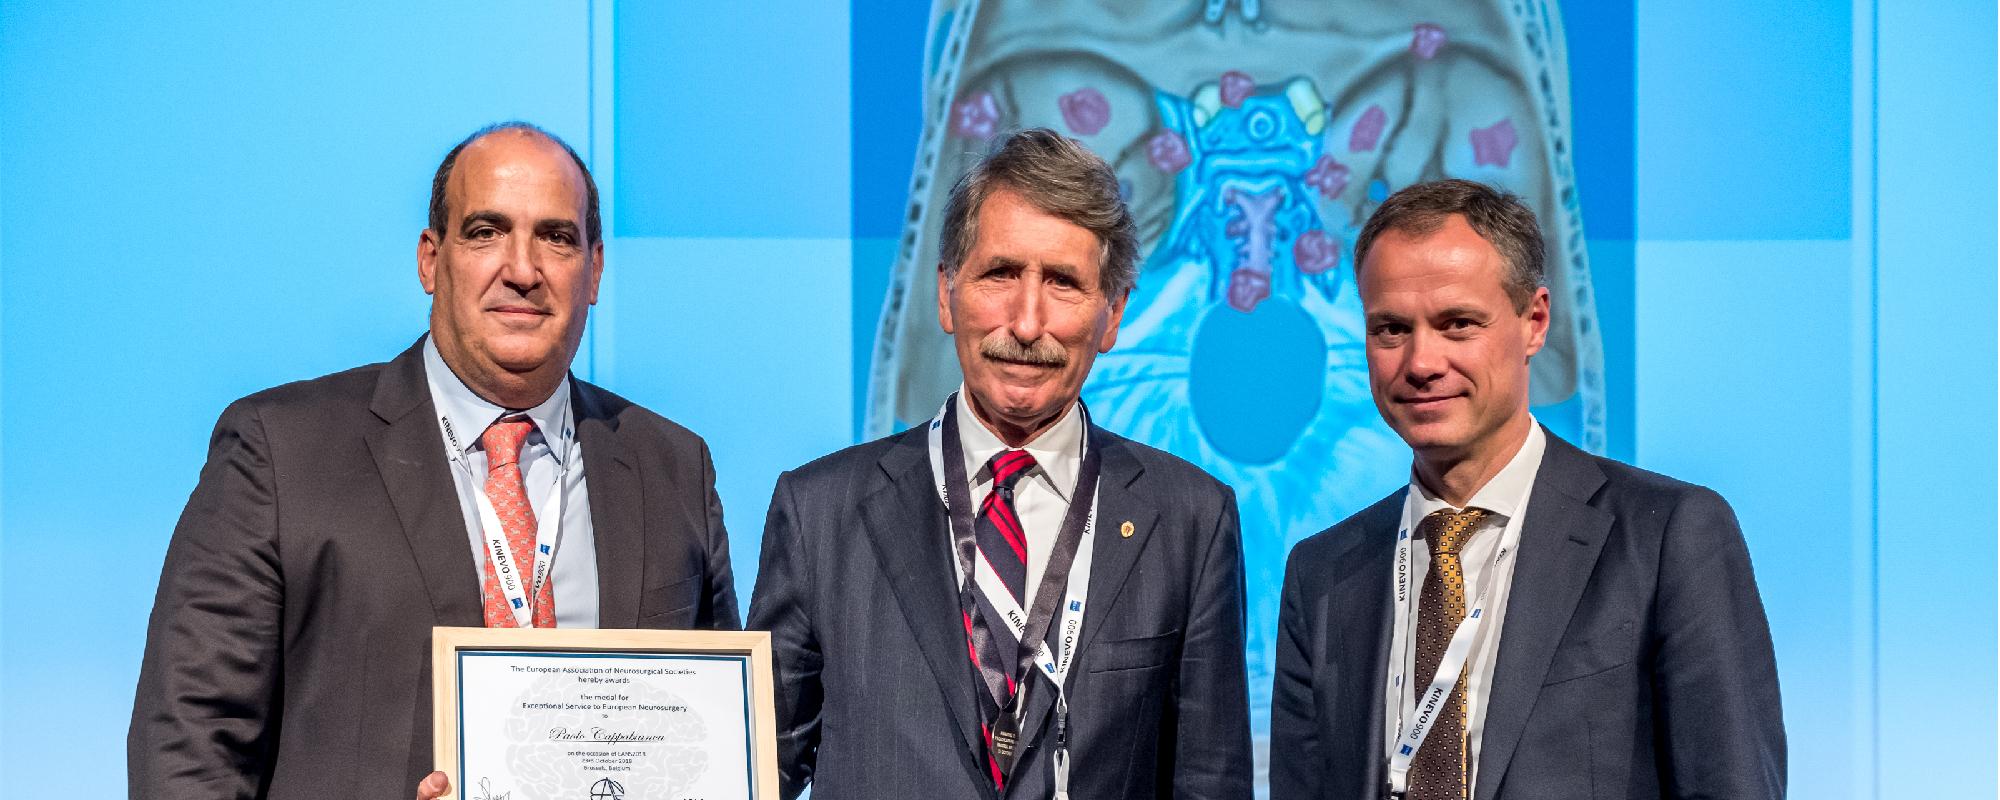 European Association of Neurosurgical Societies